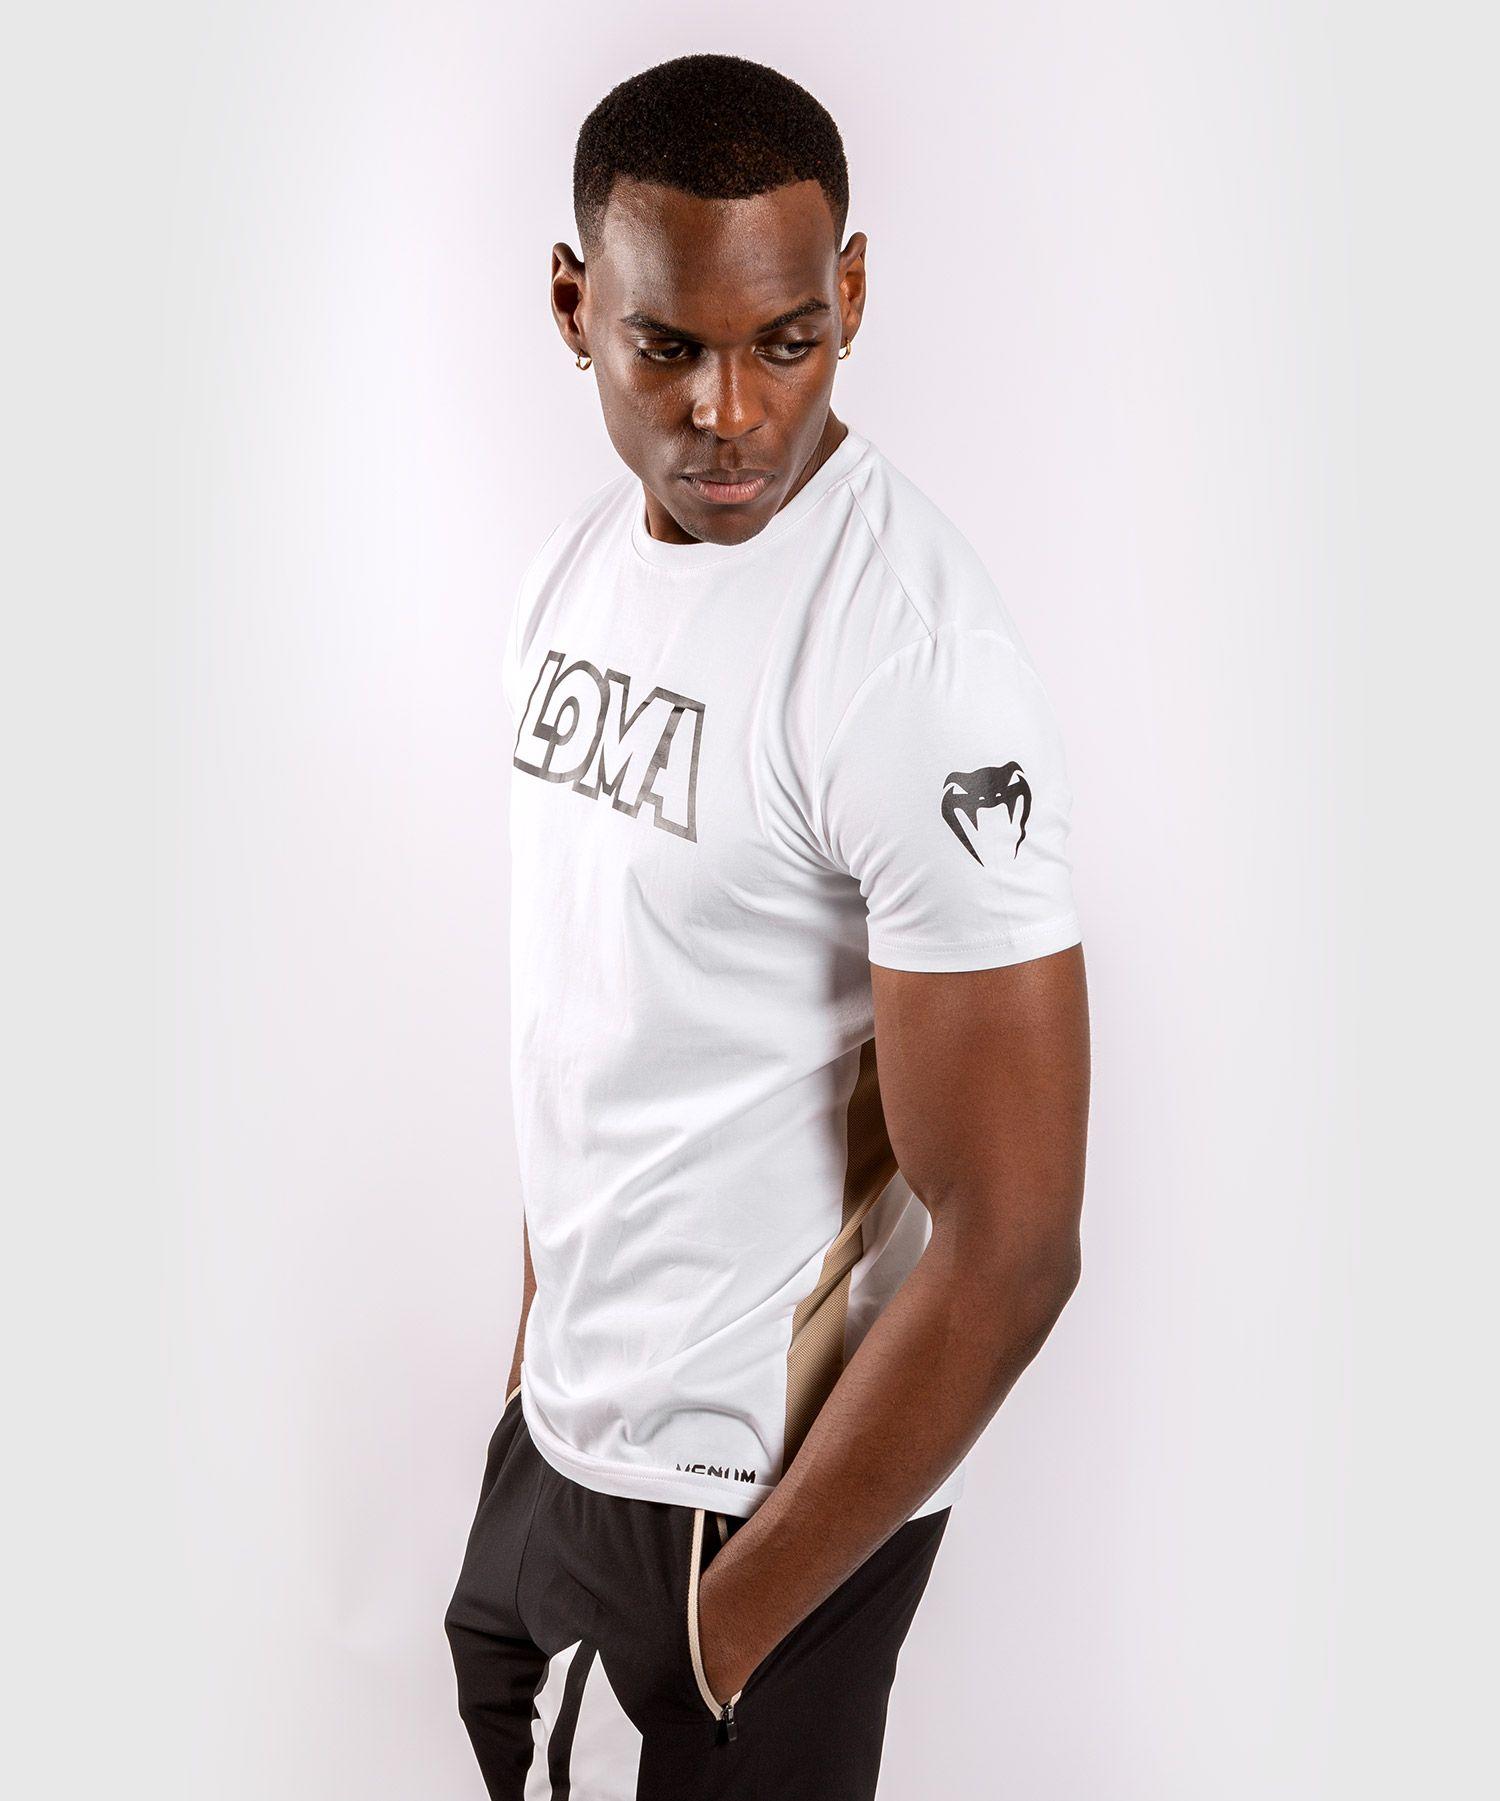 Футболка Venum Origins T-shirt Loma Edition White Размер: M